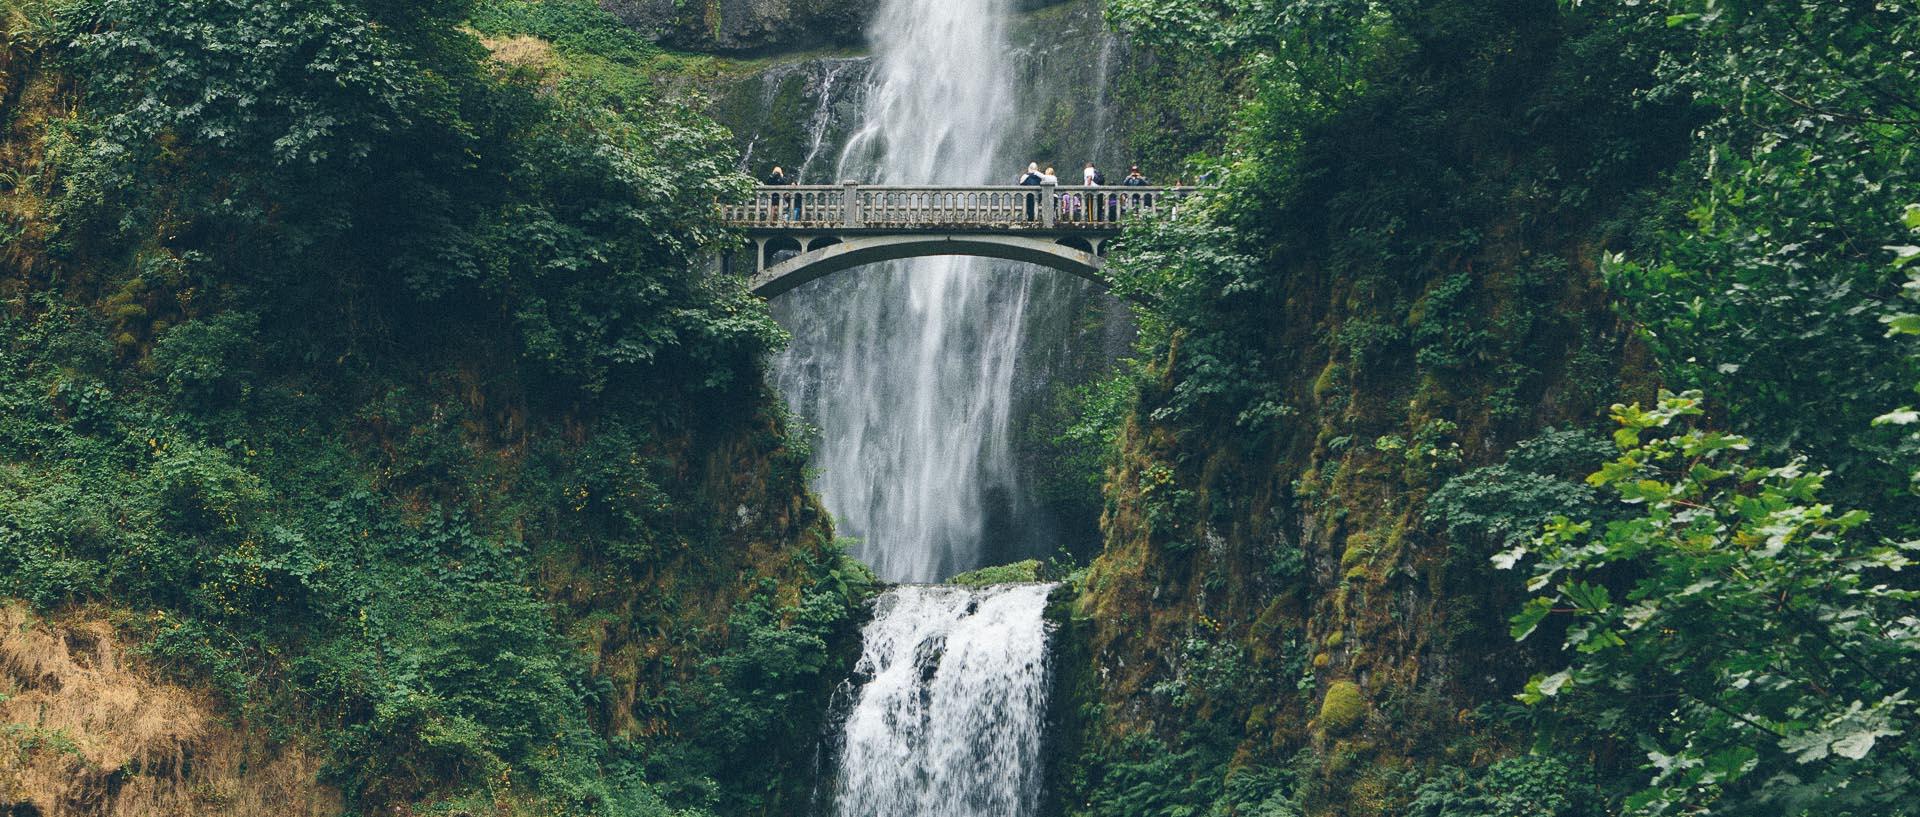 Portland Or The Democratic Travelers